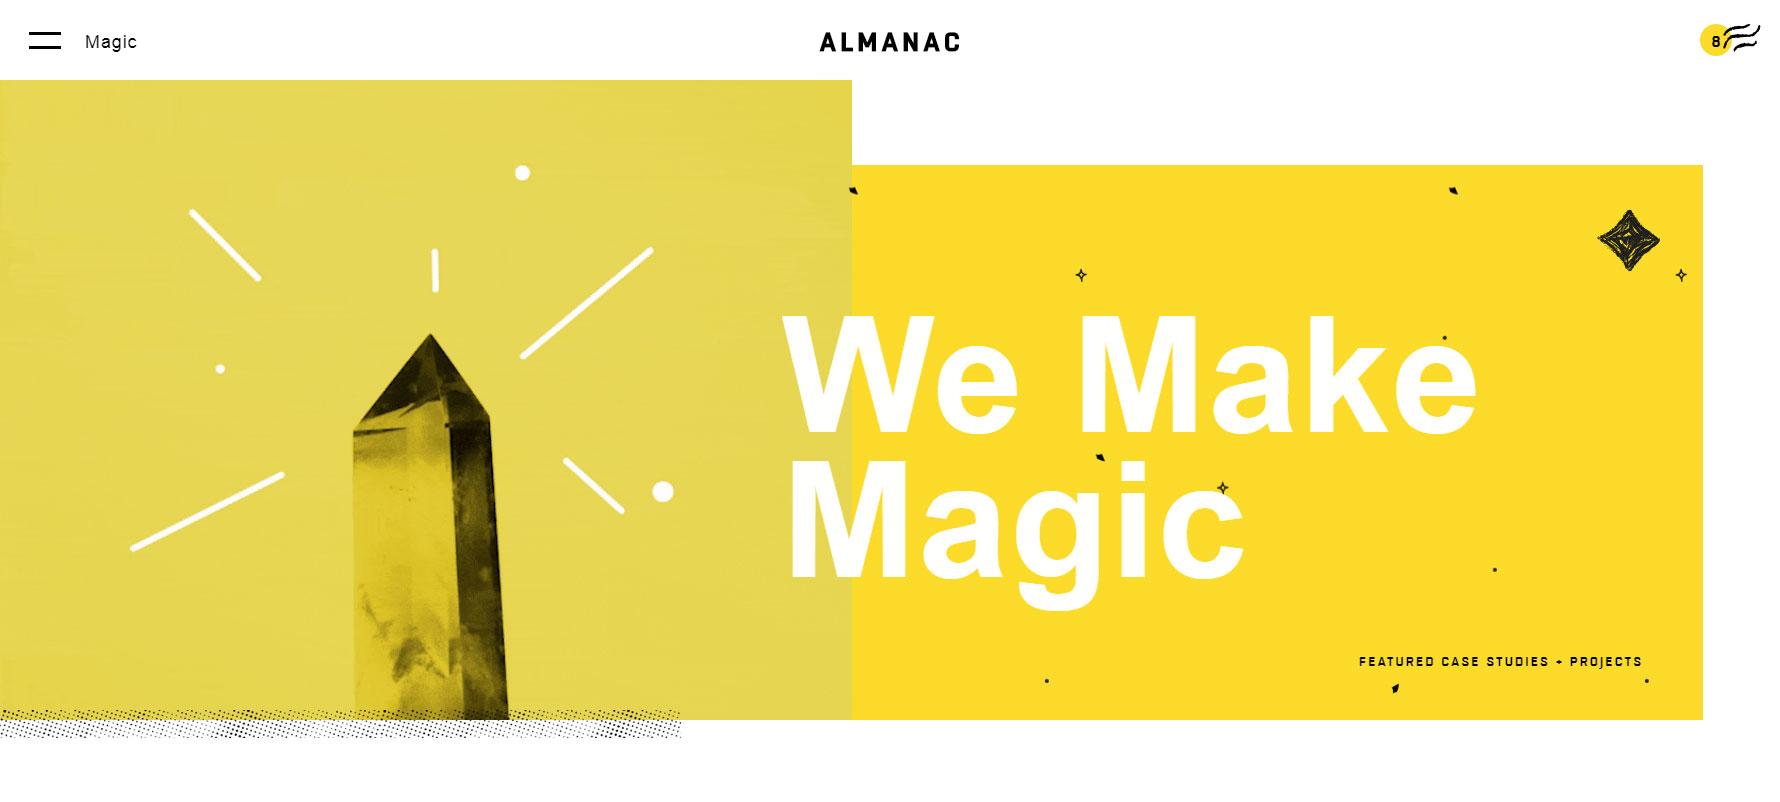 Almanac - Website of the Month